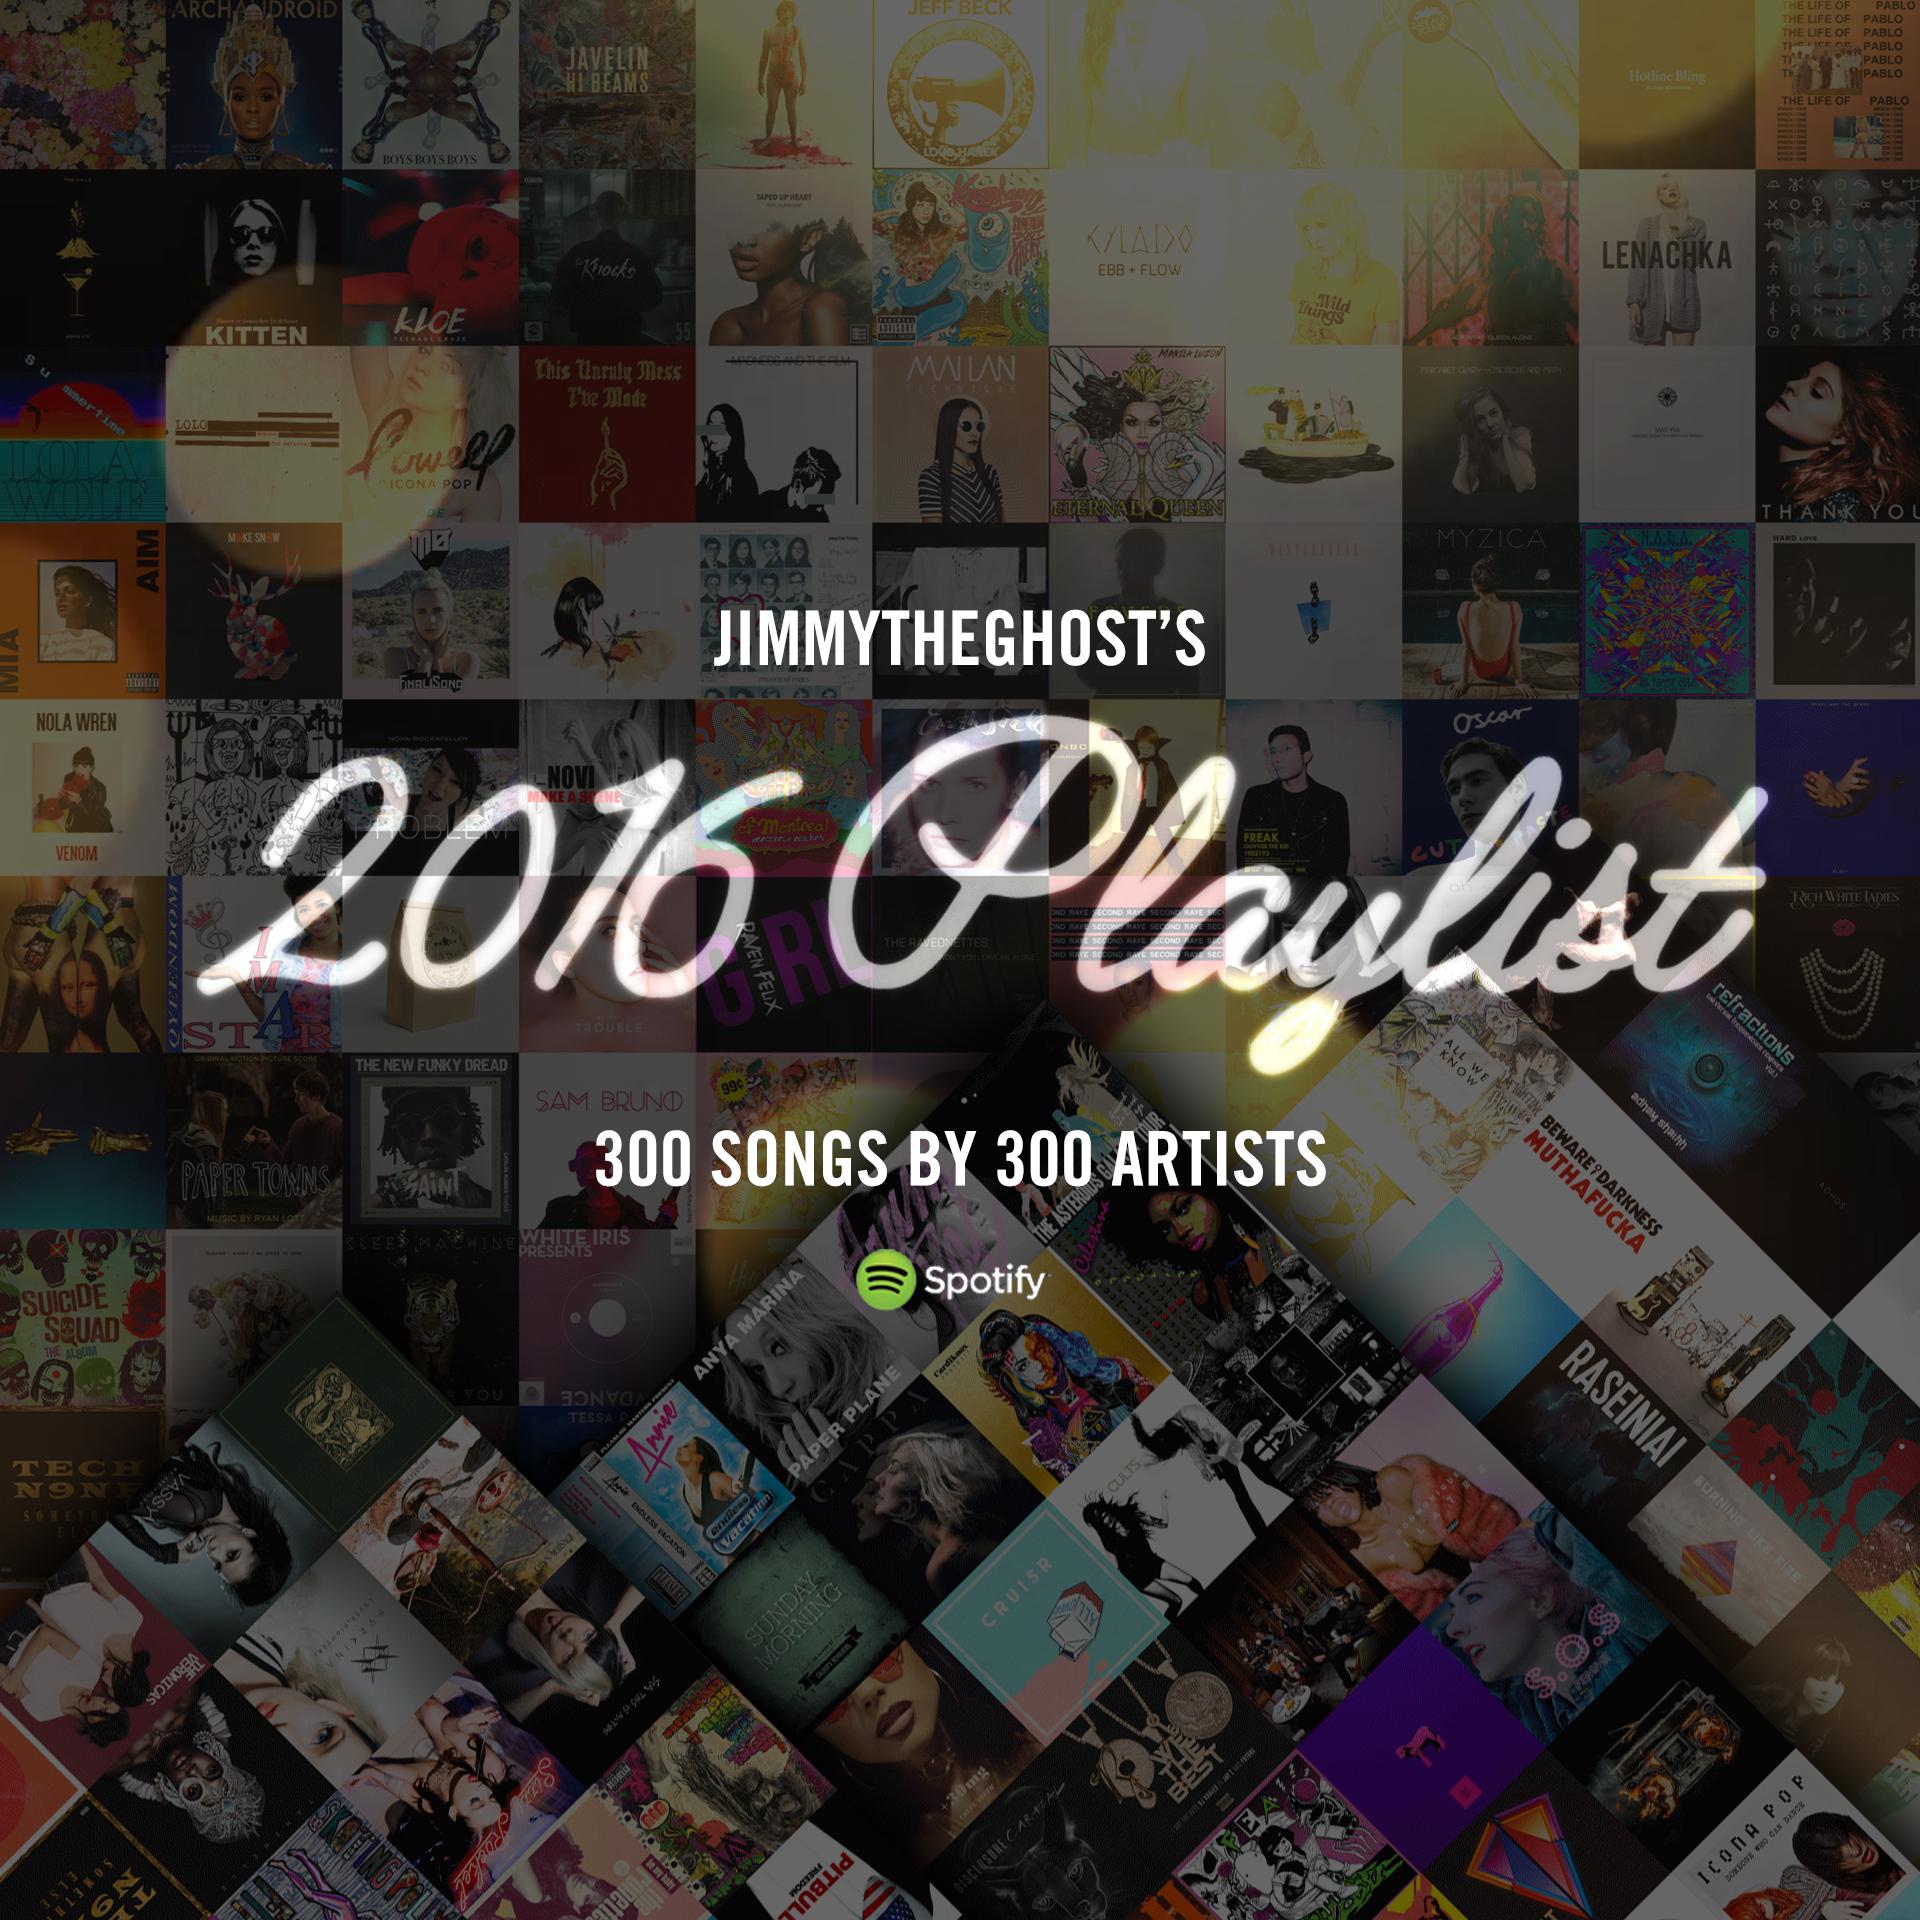 The 2016 PLaylist -